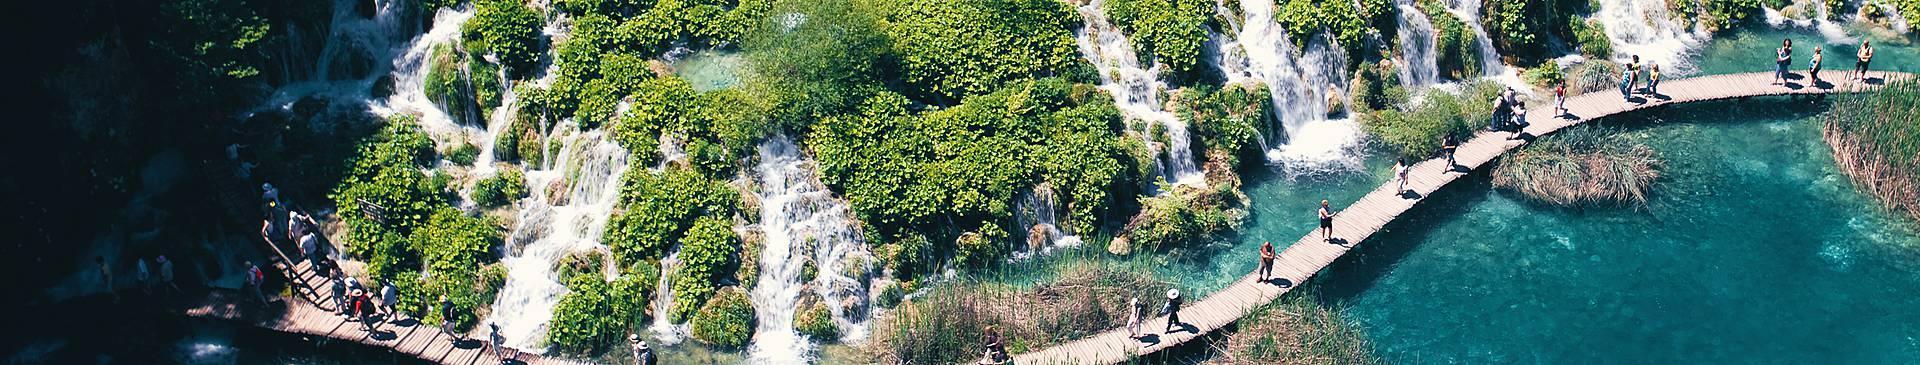 Croatia lakes